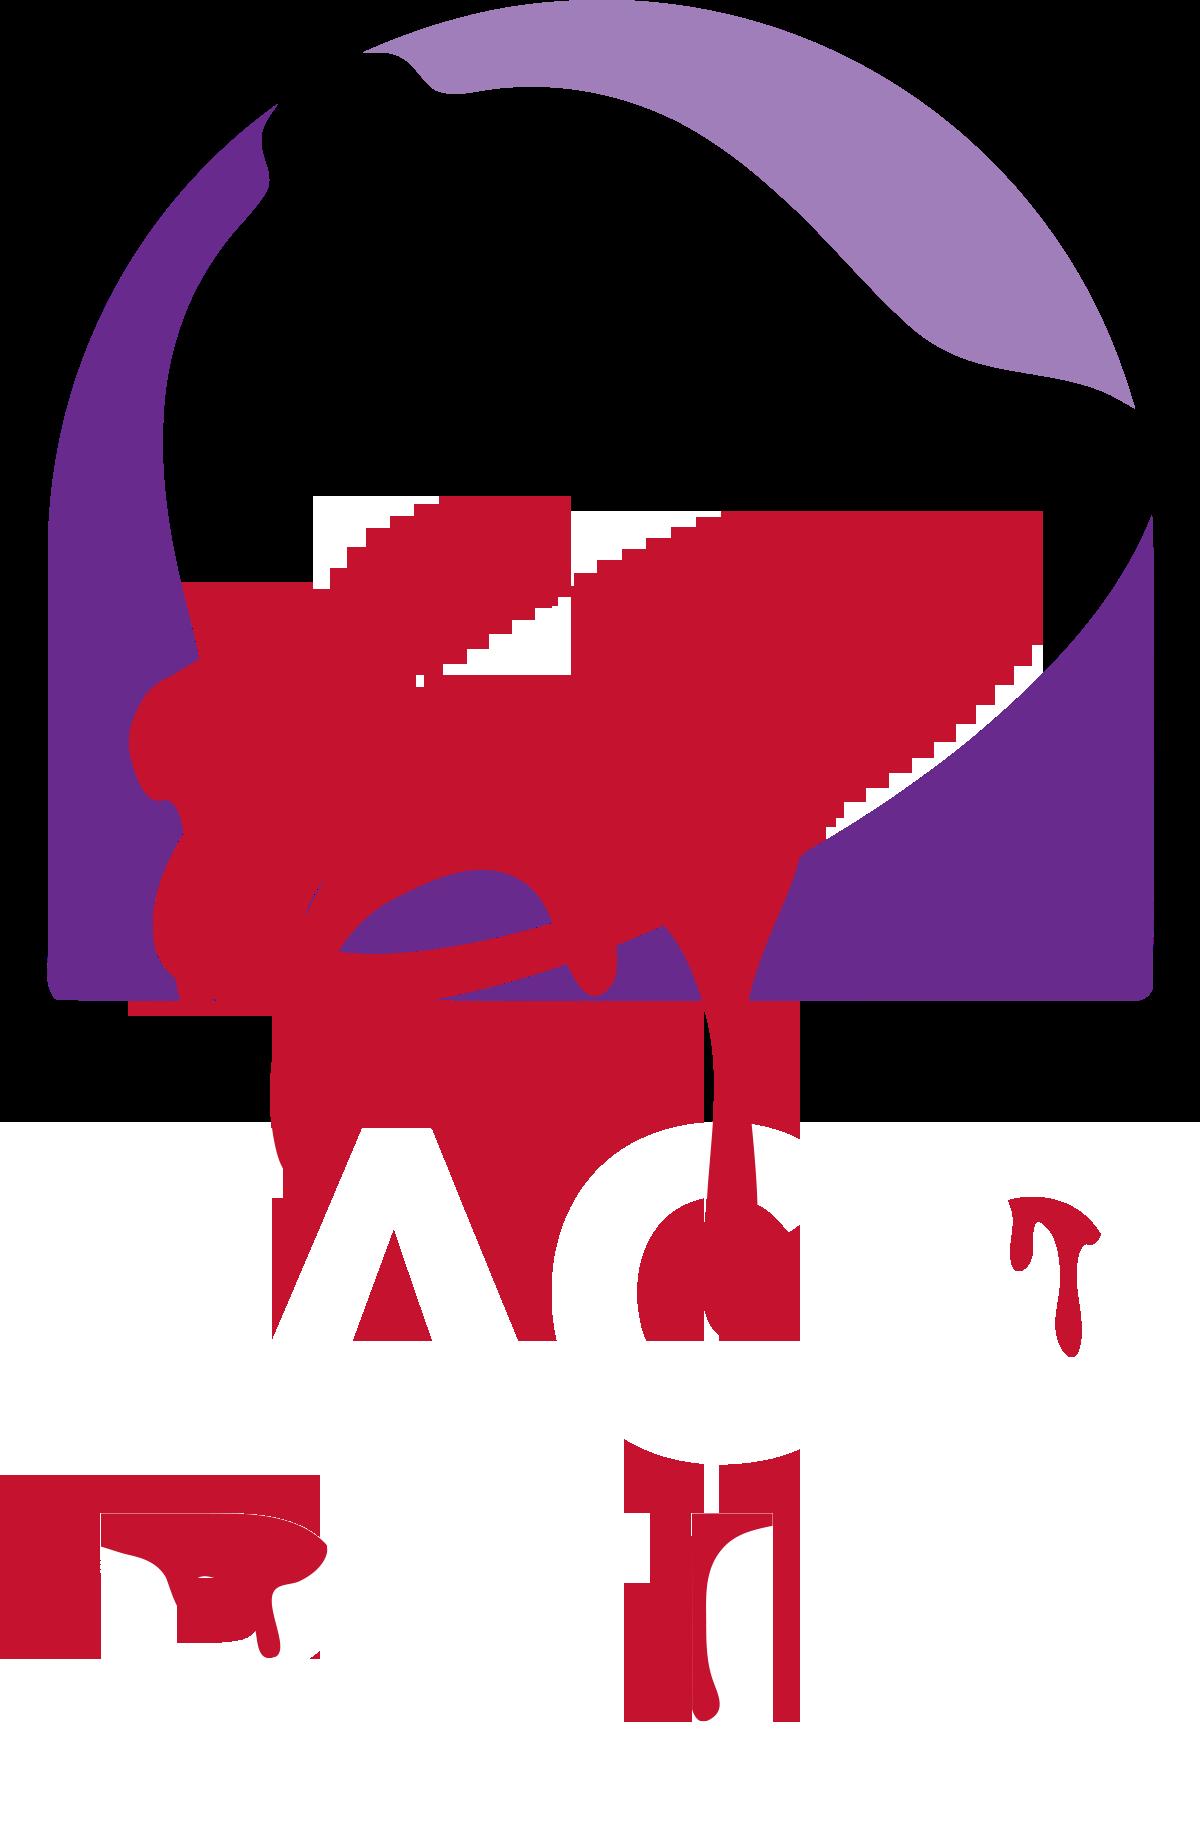 Taco bell logo cruelty